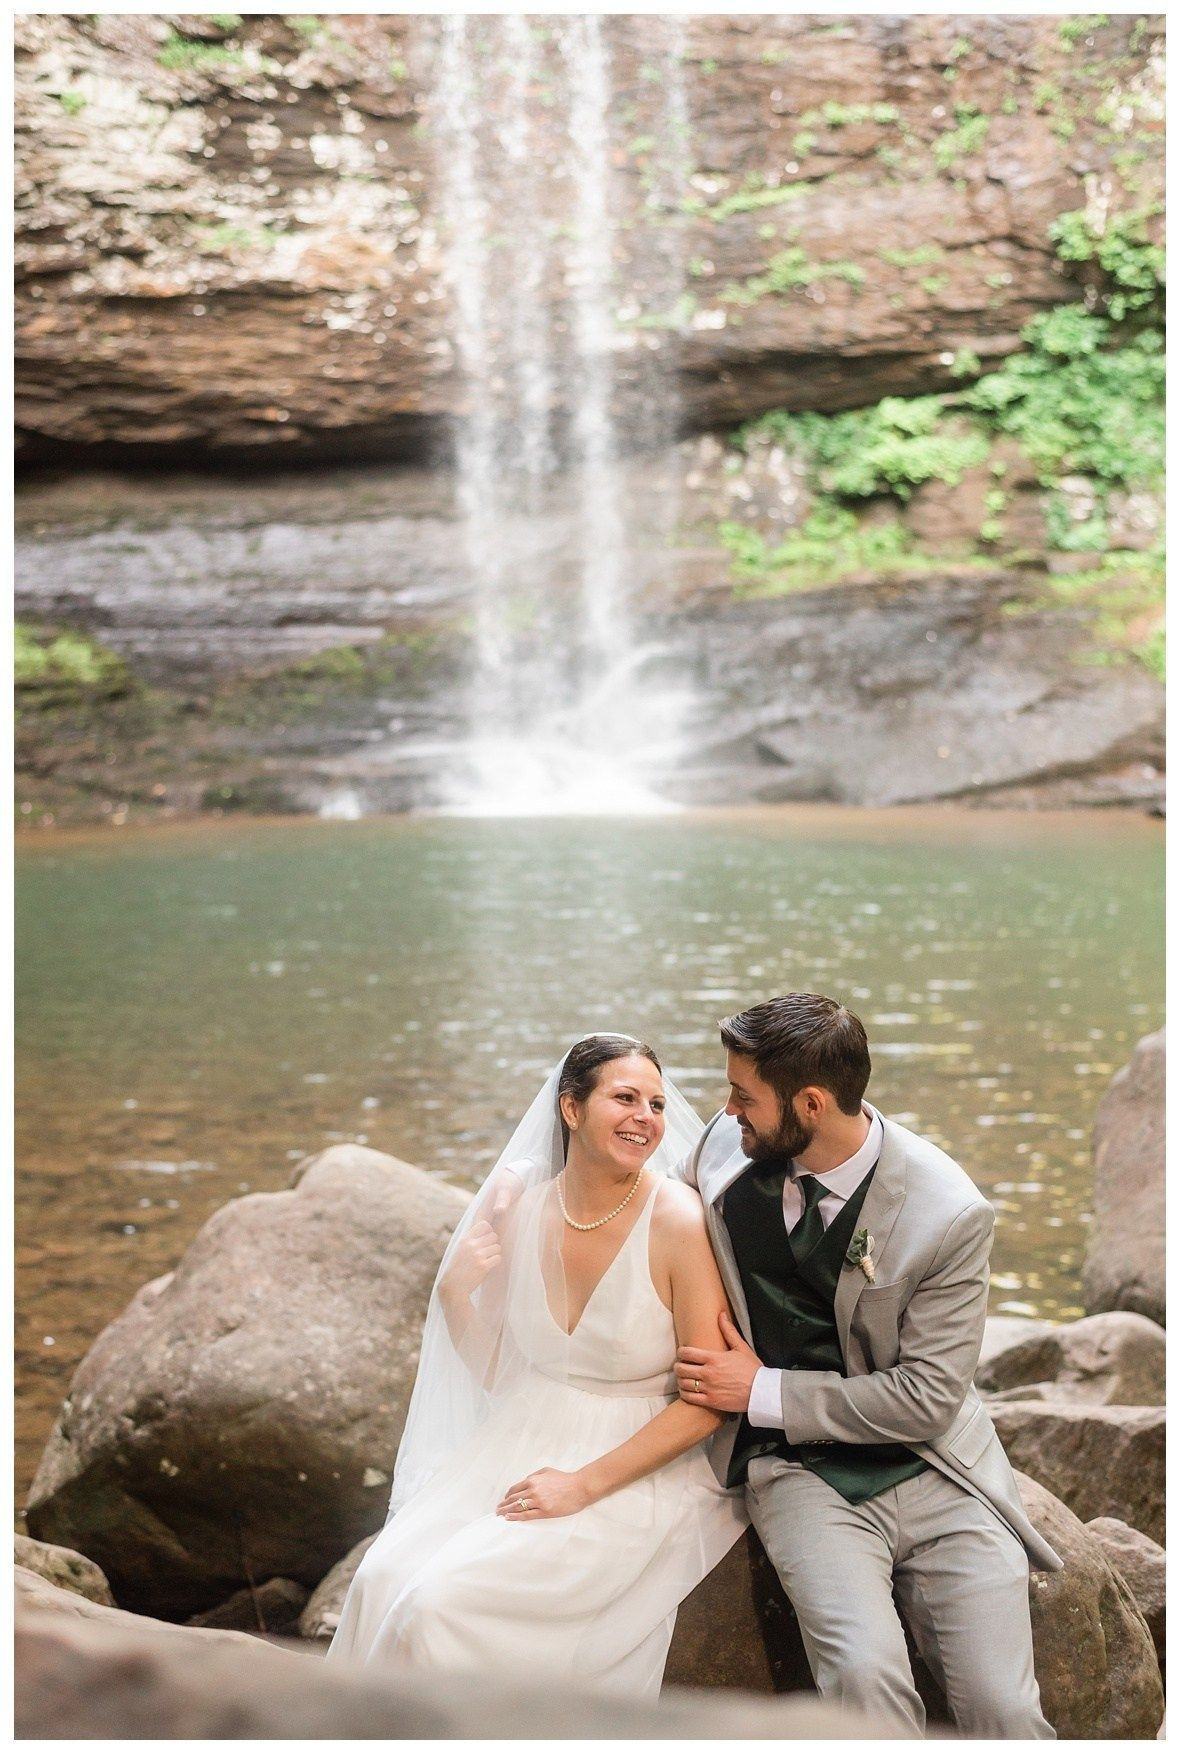 44++ Wedding venues in chattanooga tn area information